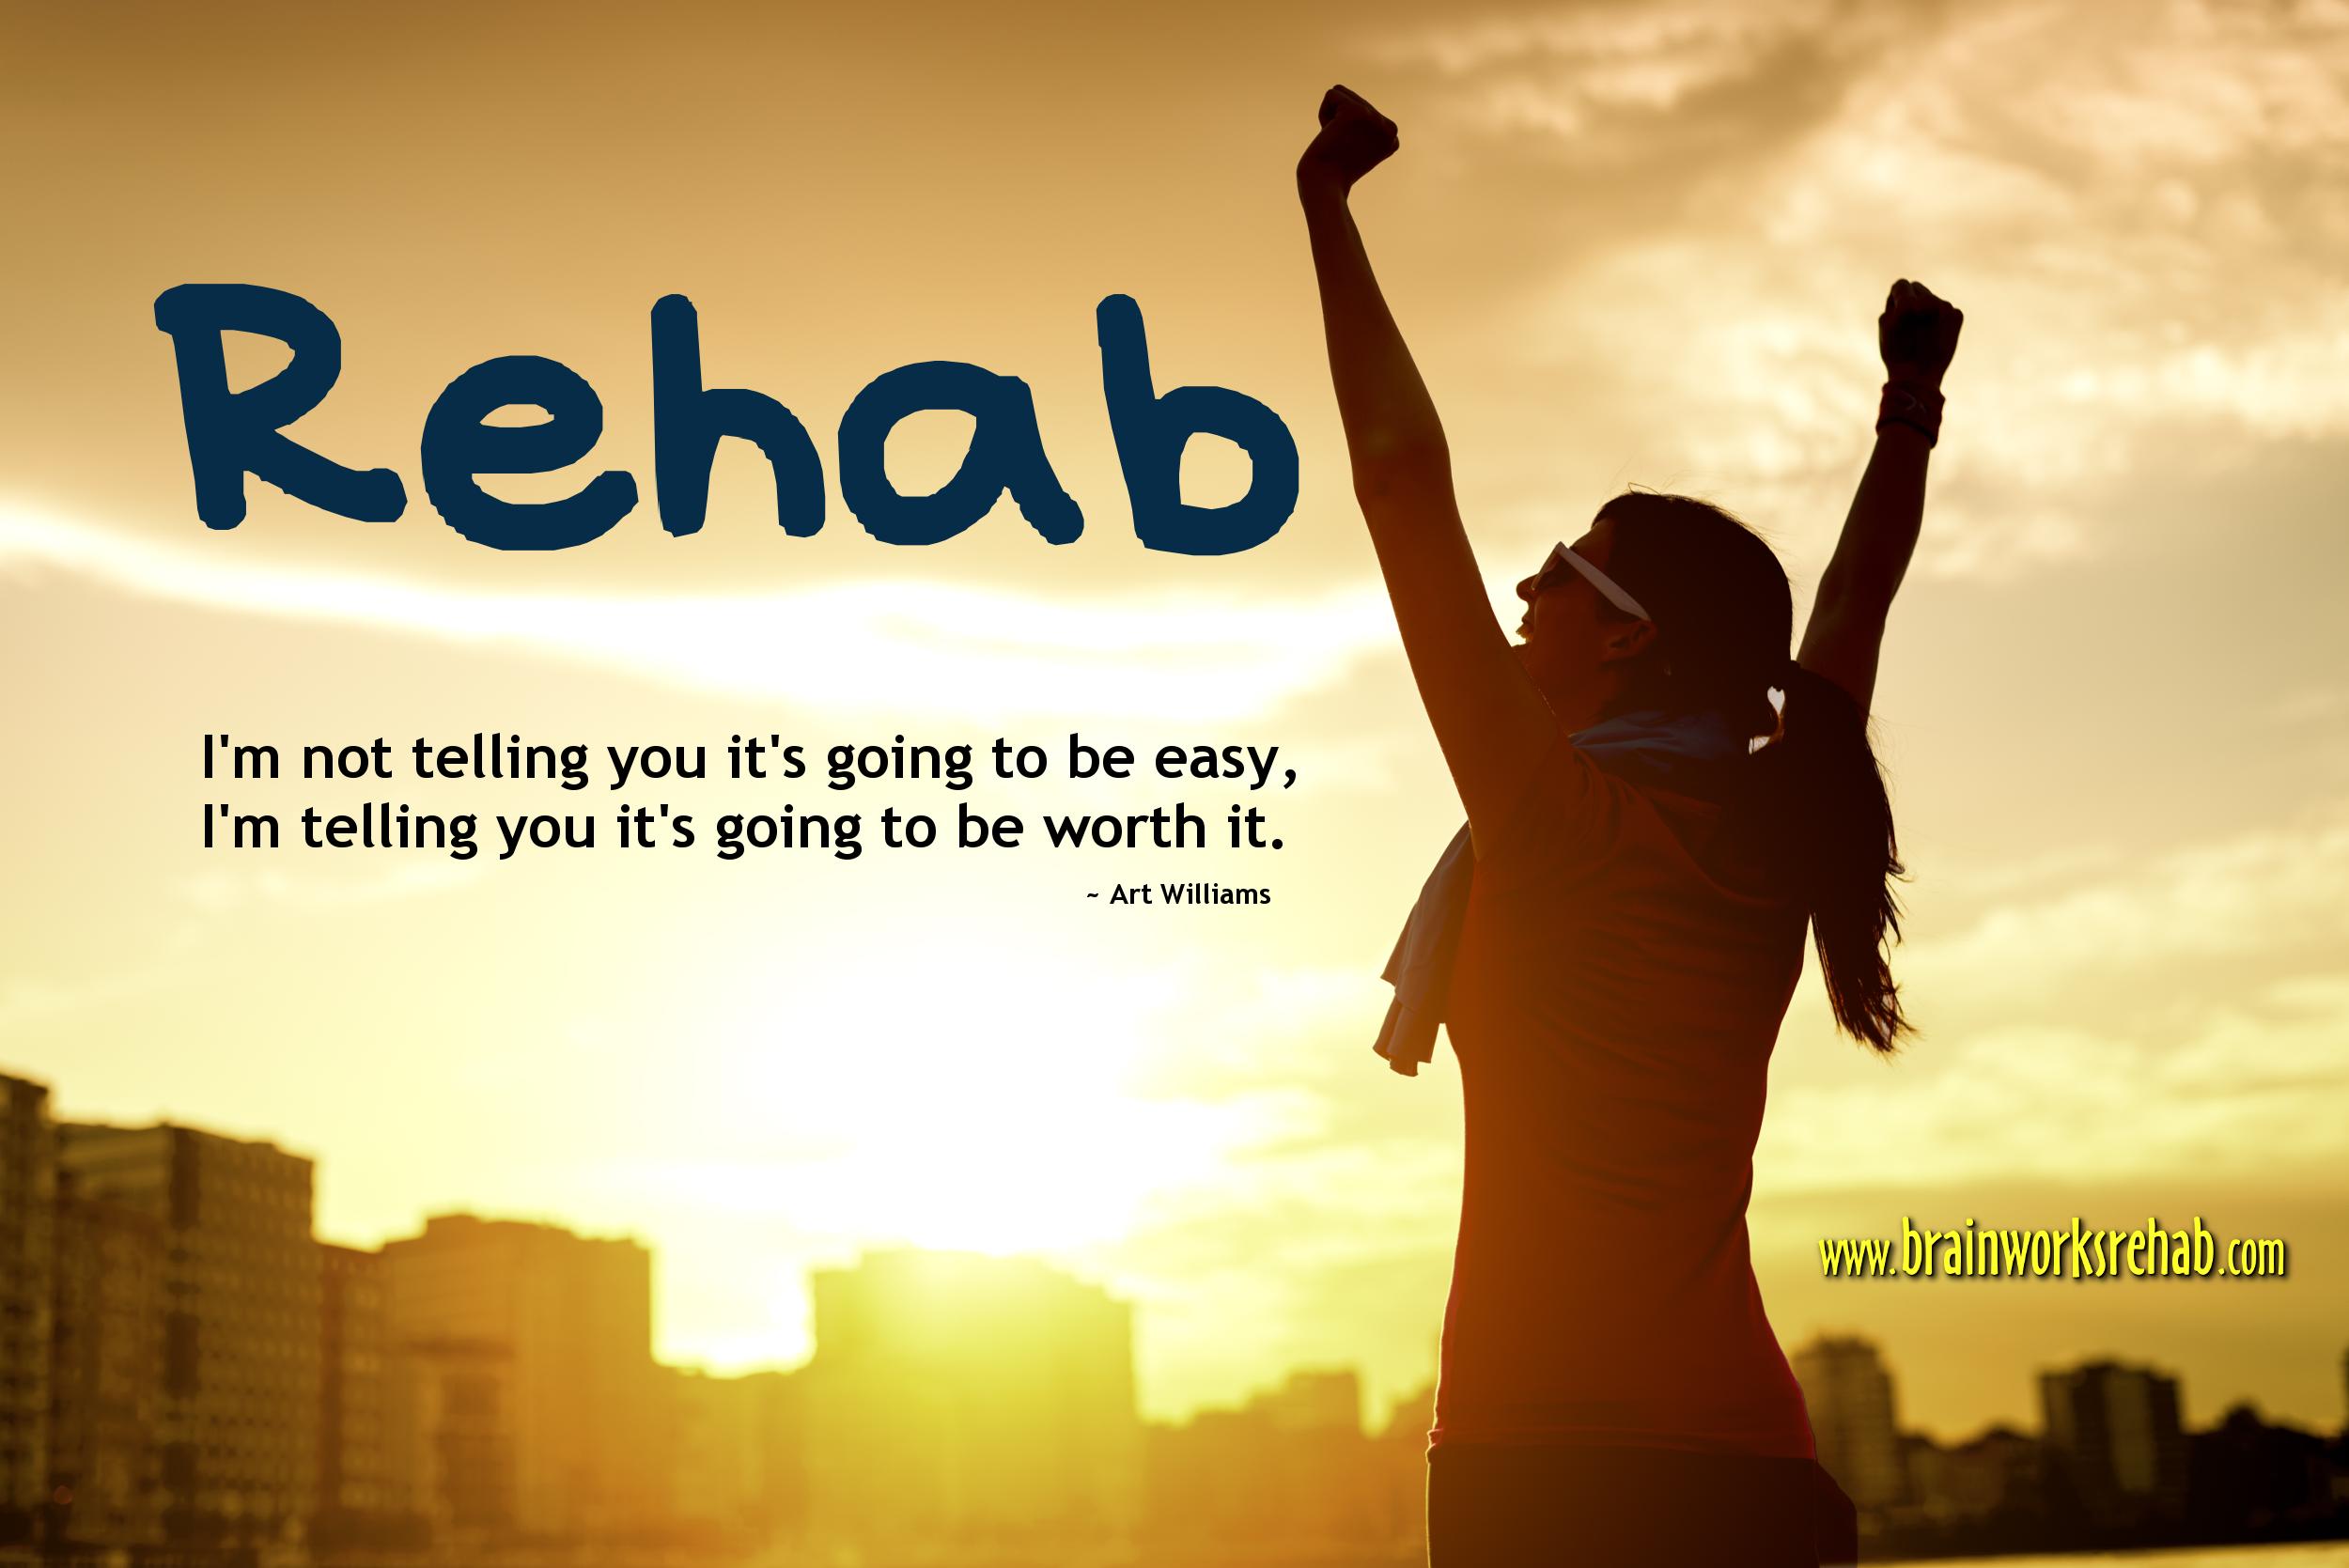 Free Rehab Help